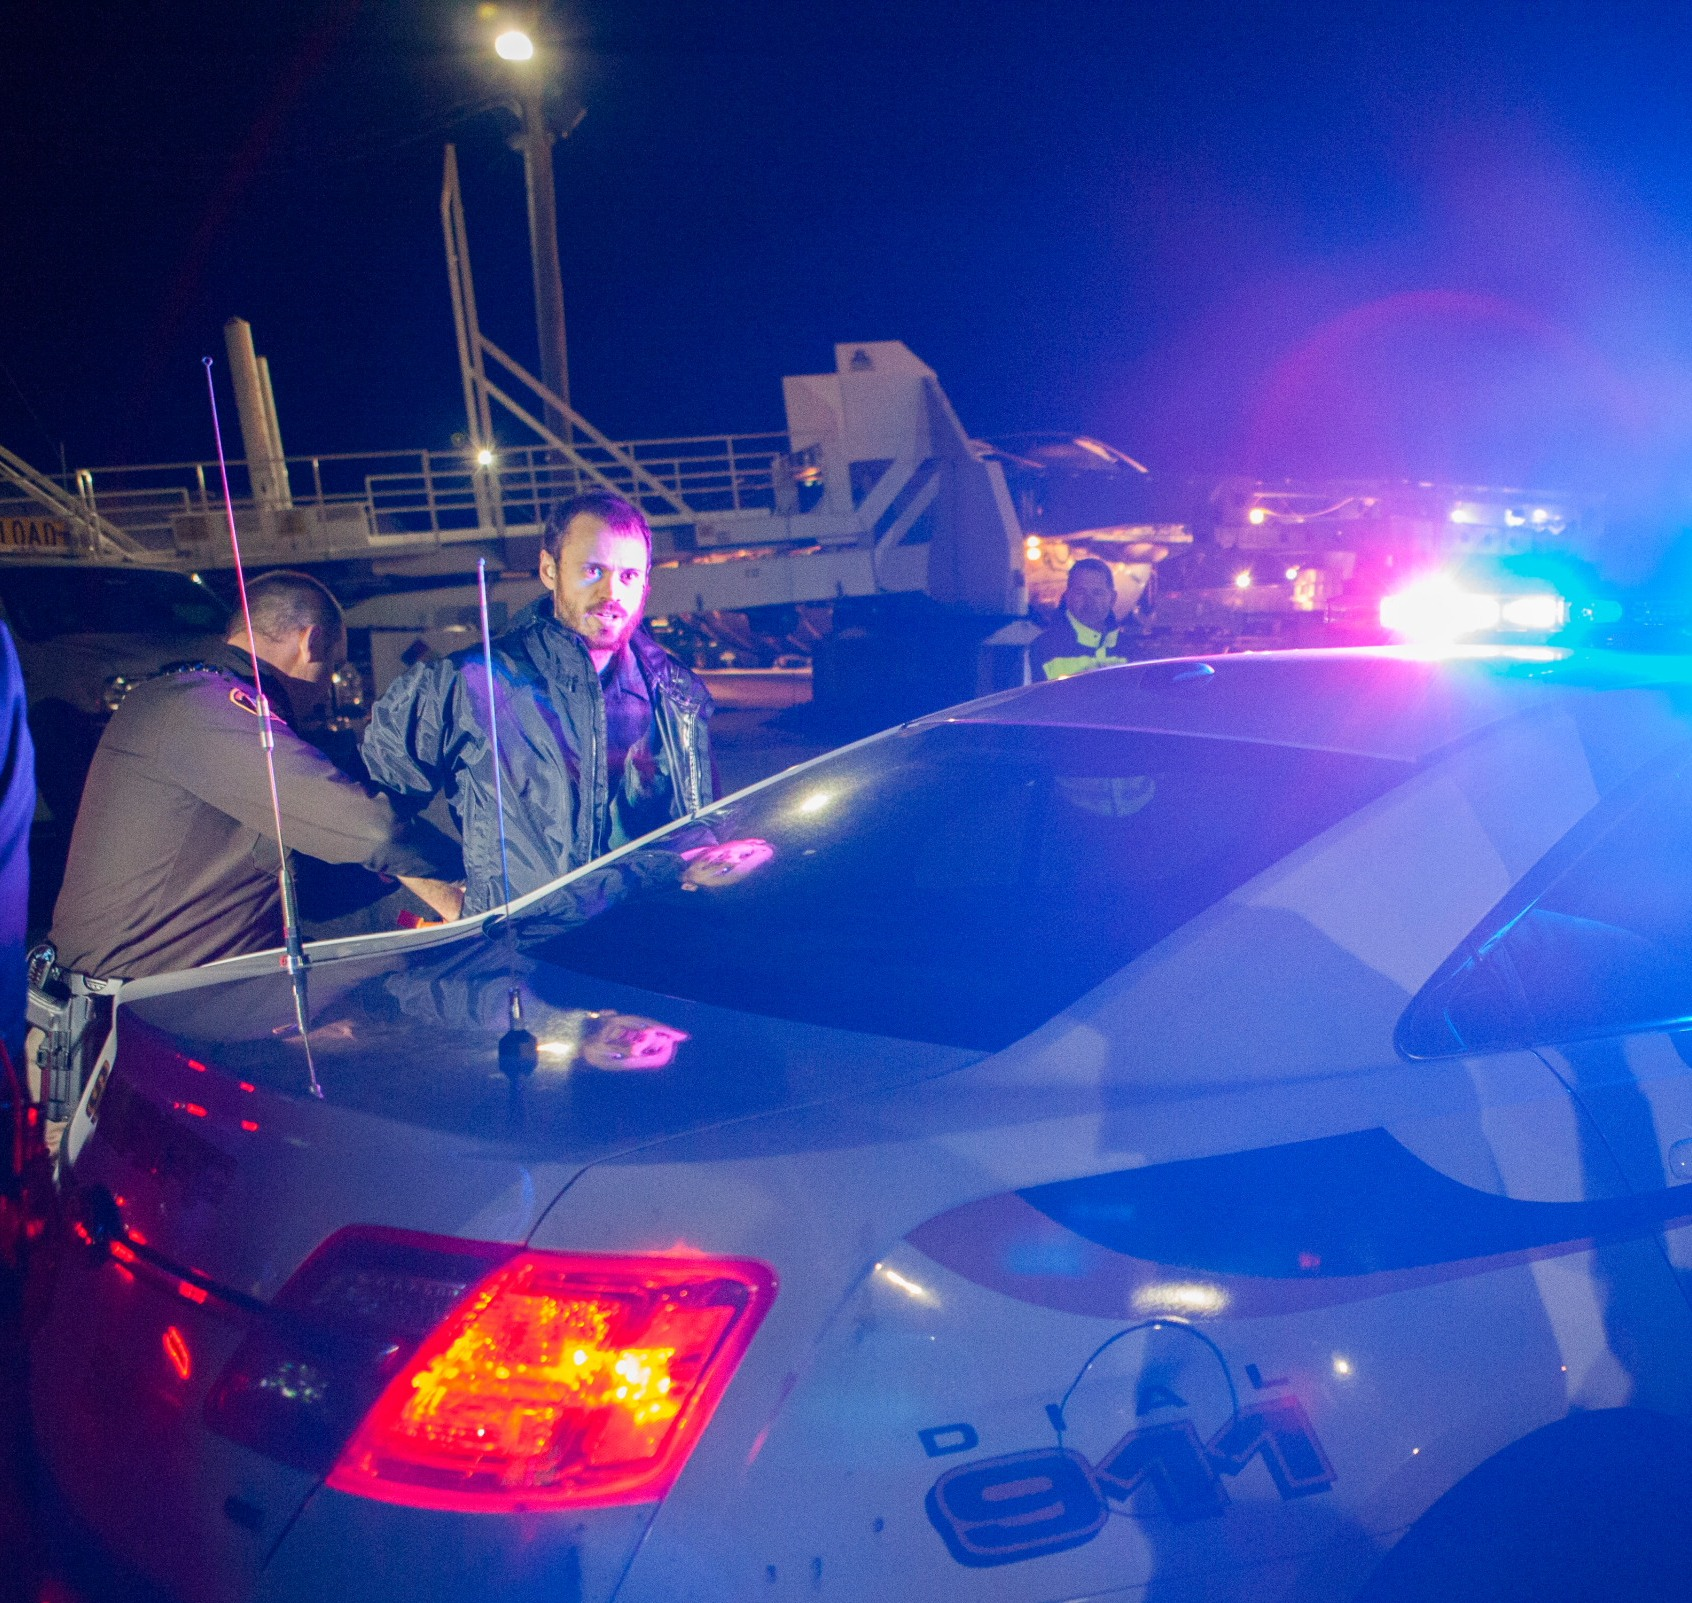 16 arrested in Eastern Oregon roadblock of megaload; further resistance expected